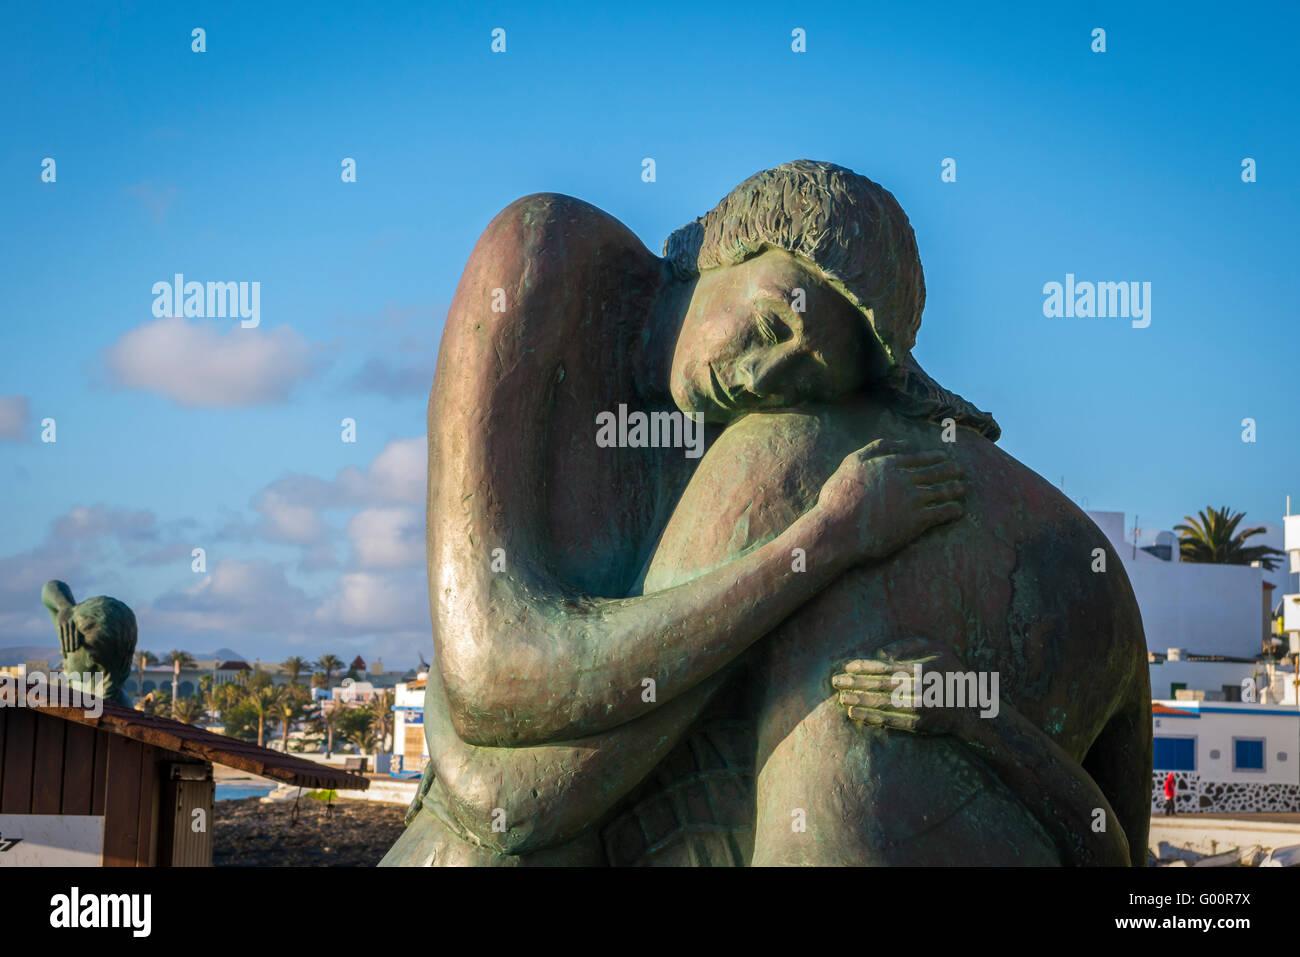 Corralejo Fuerteventura-Kanarische Inseln-Spanien Stockfoto